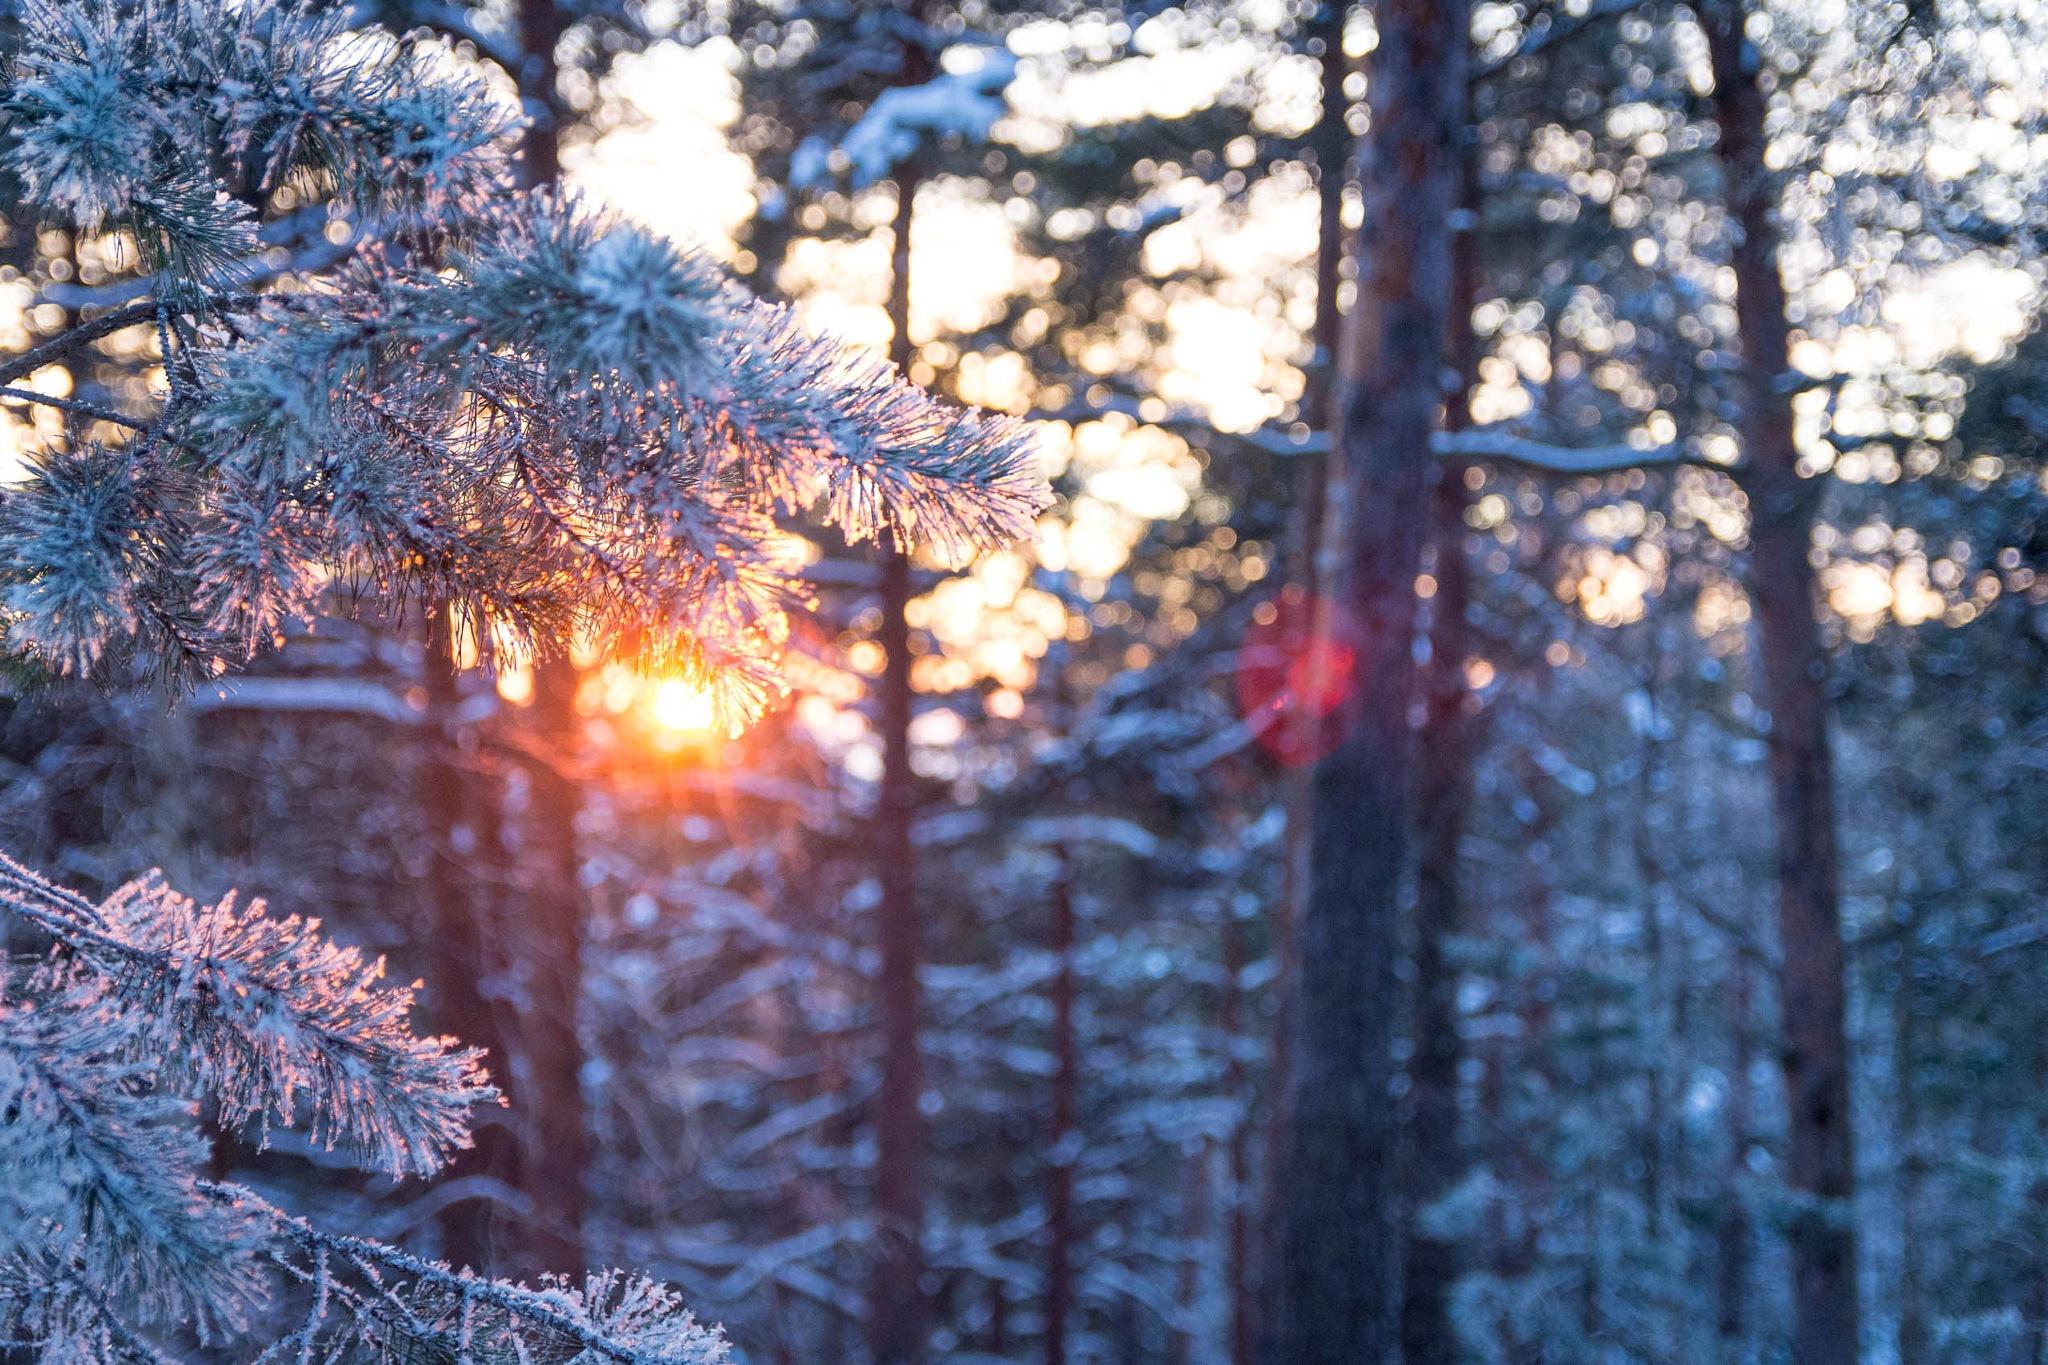 Winter Wonderland by Petri Pihlaja